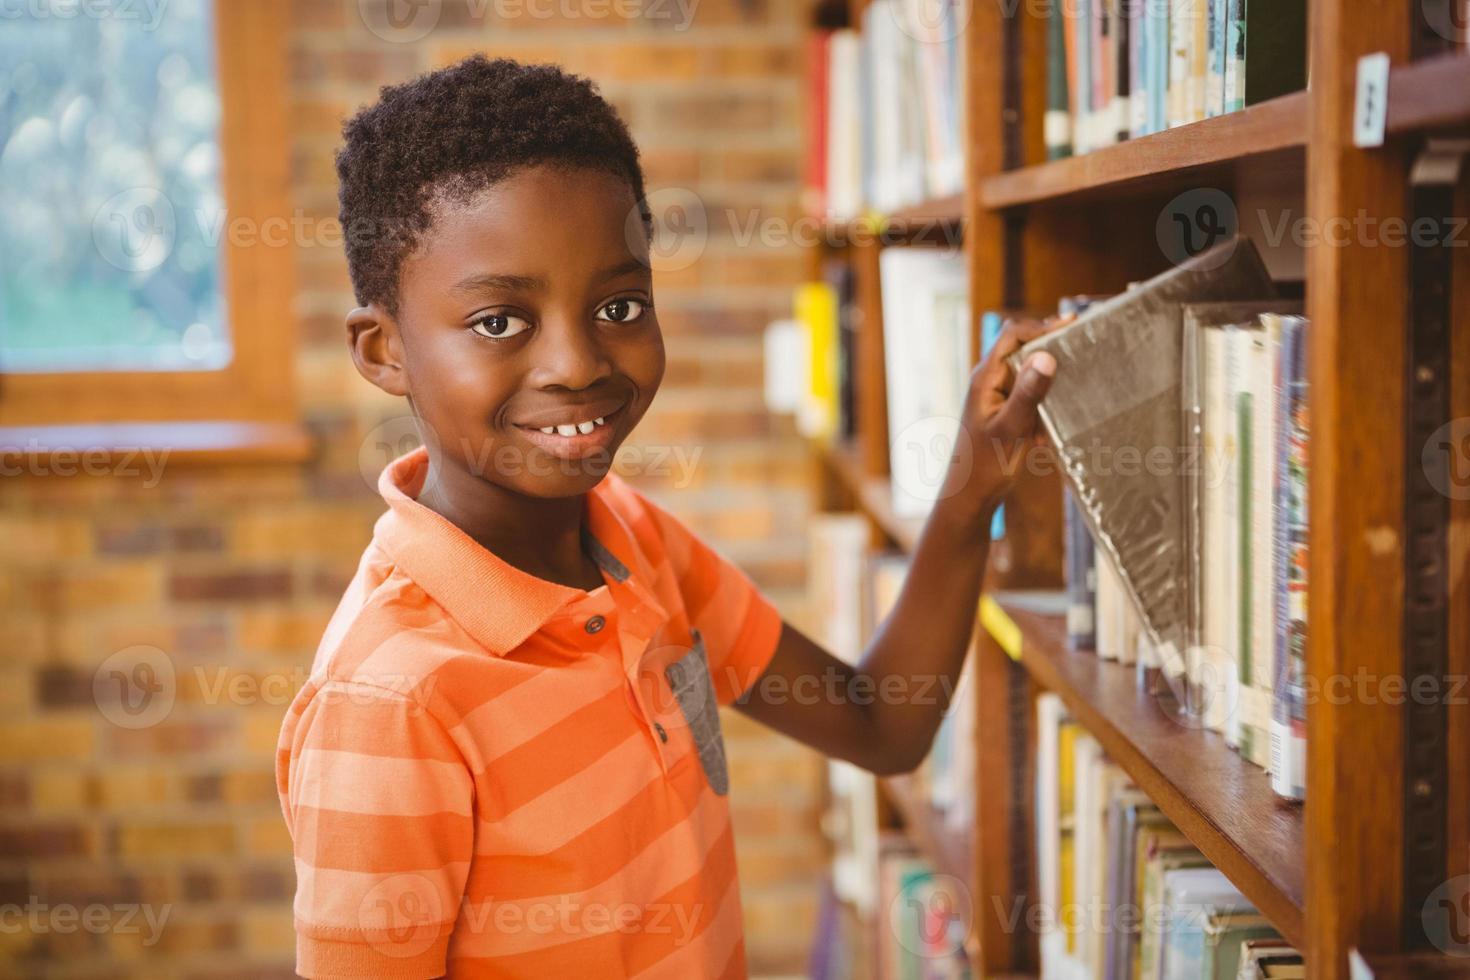 retrato de menino, selecionando o livro na biblioteca foto